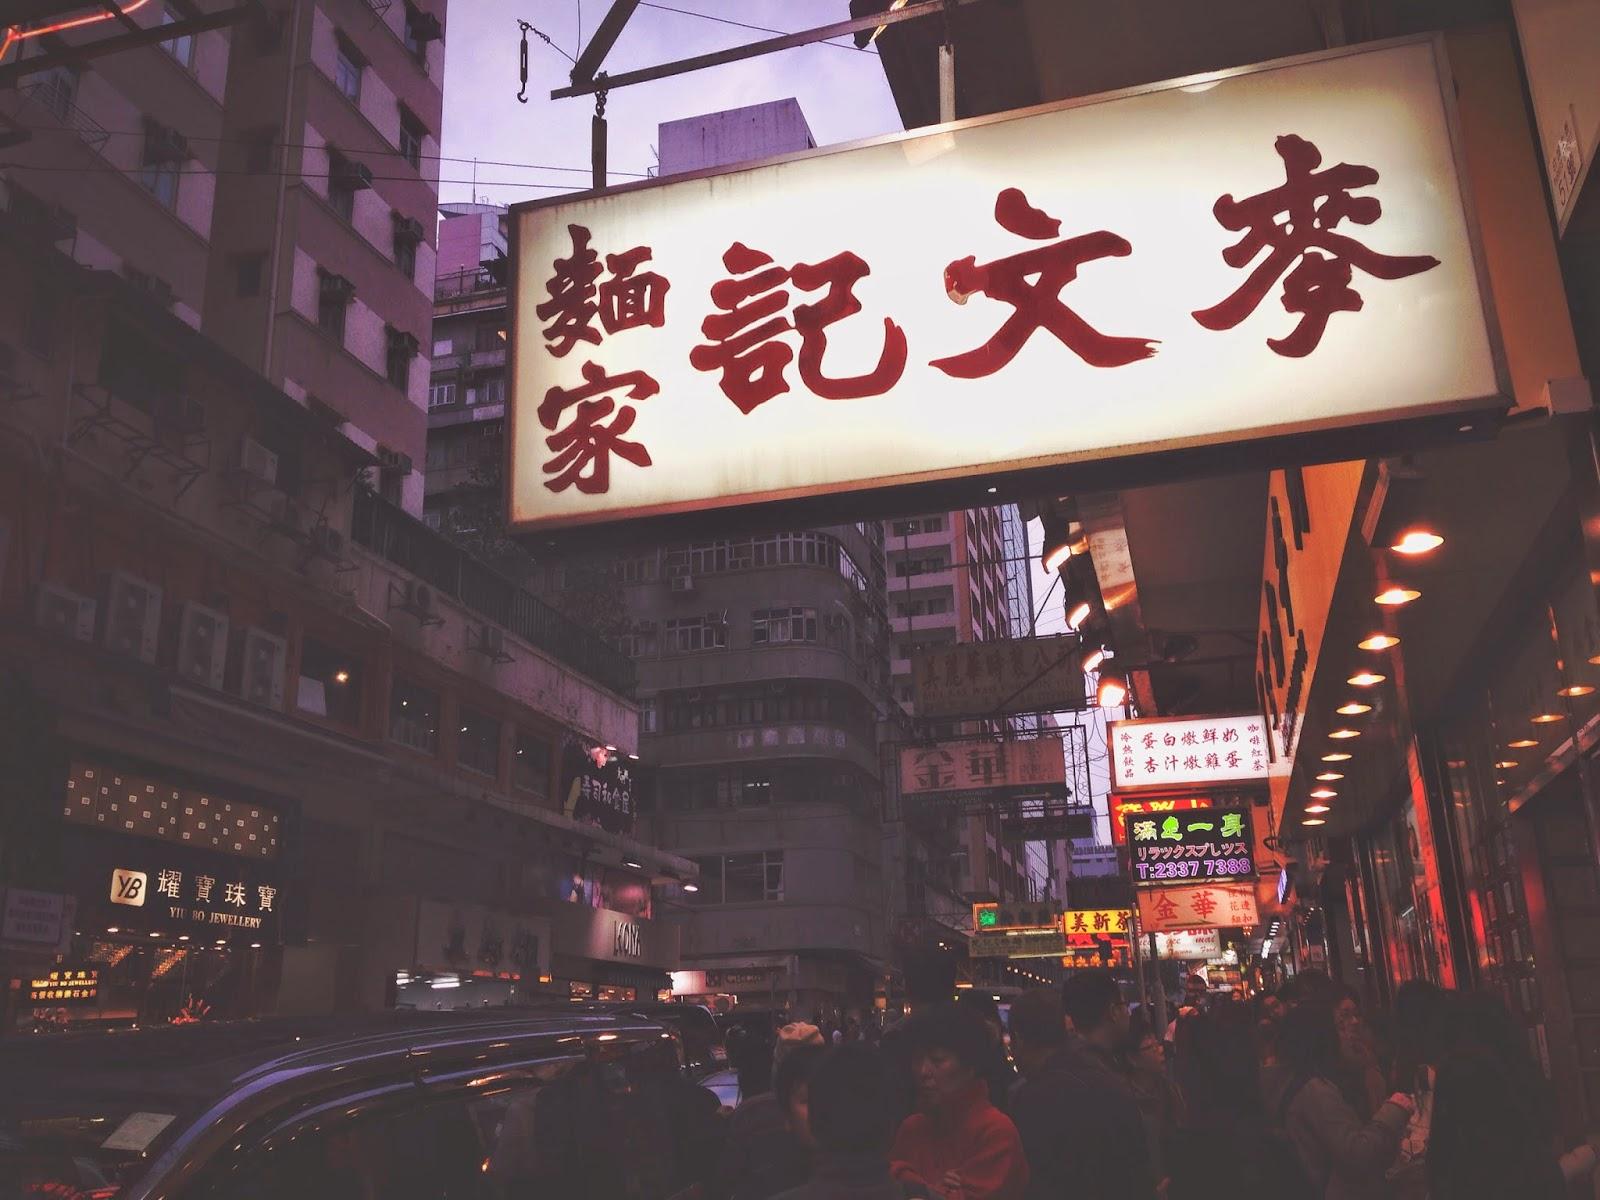 Mak Man Kee Noodle Shop Parkes St, Jordan, Hong Kong